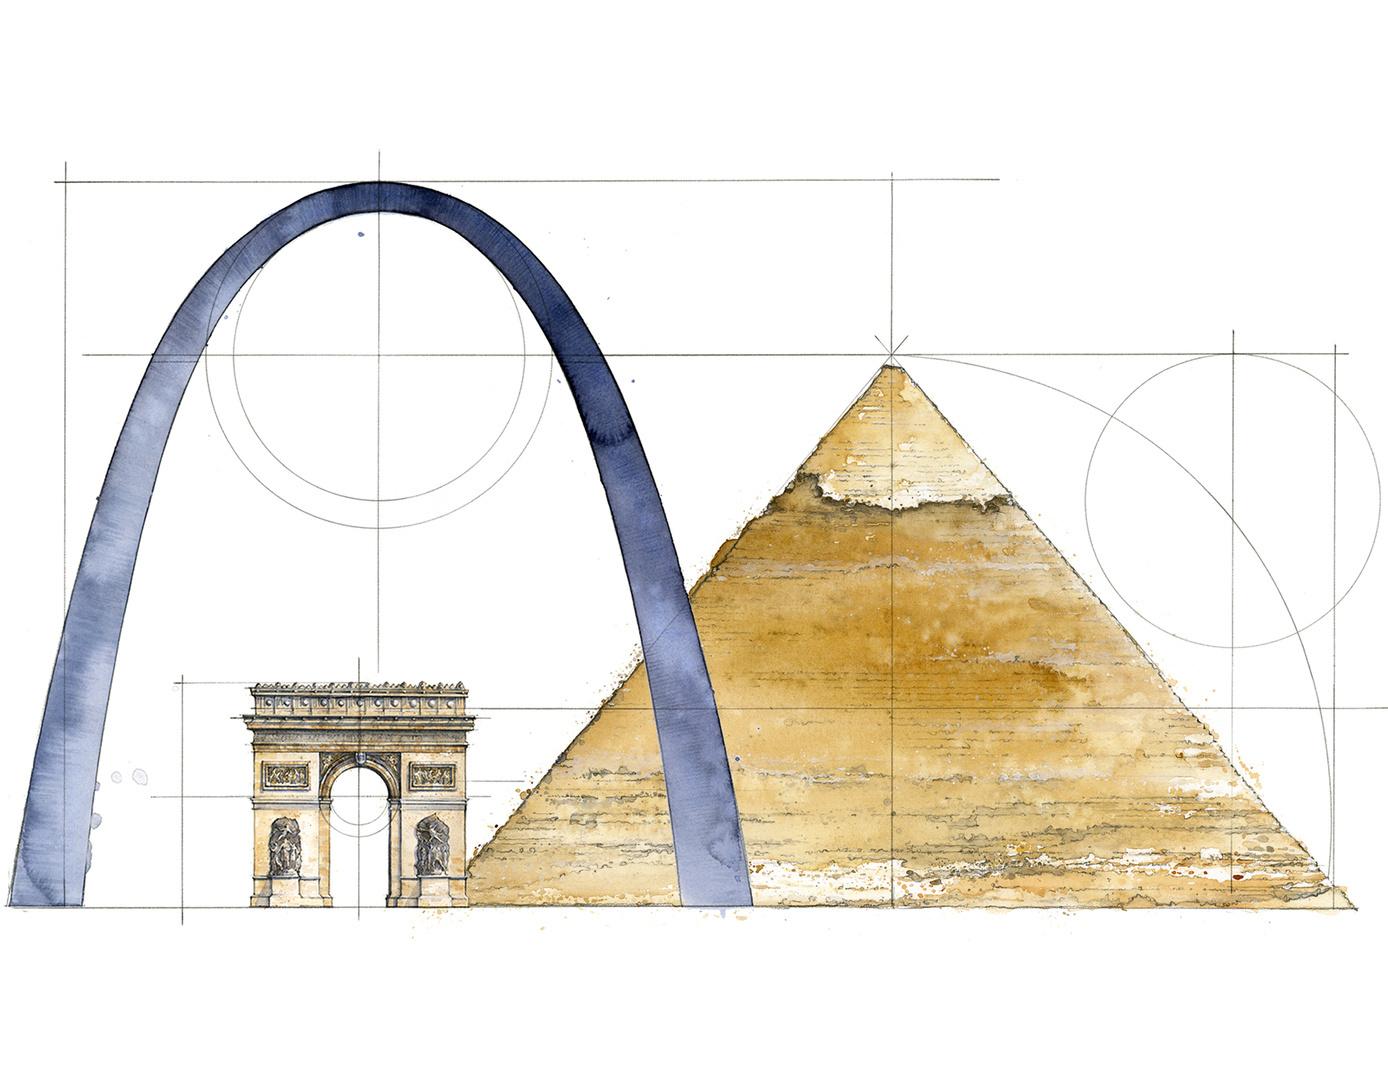 vwbk2012_Architectural_Monuments@200.jpg